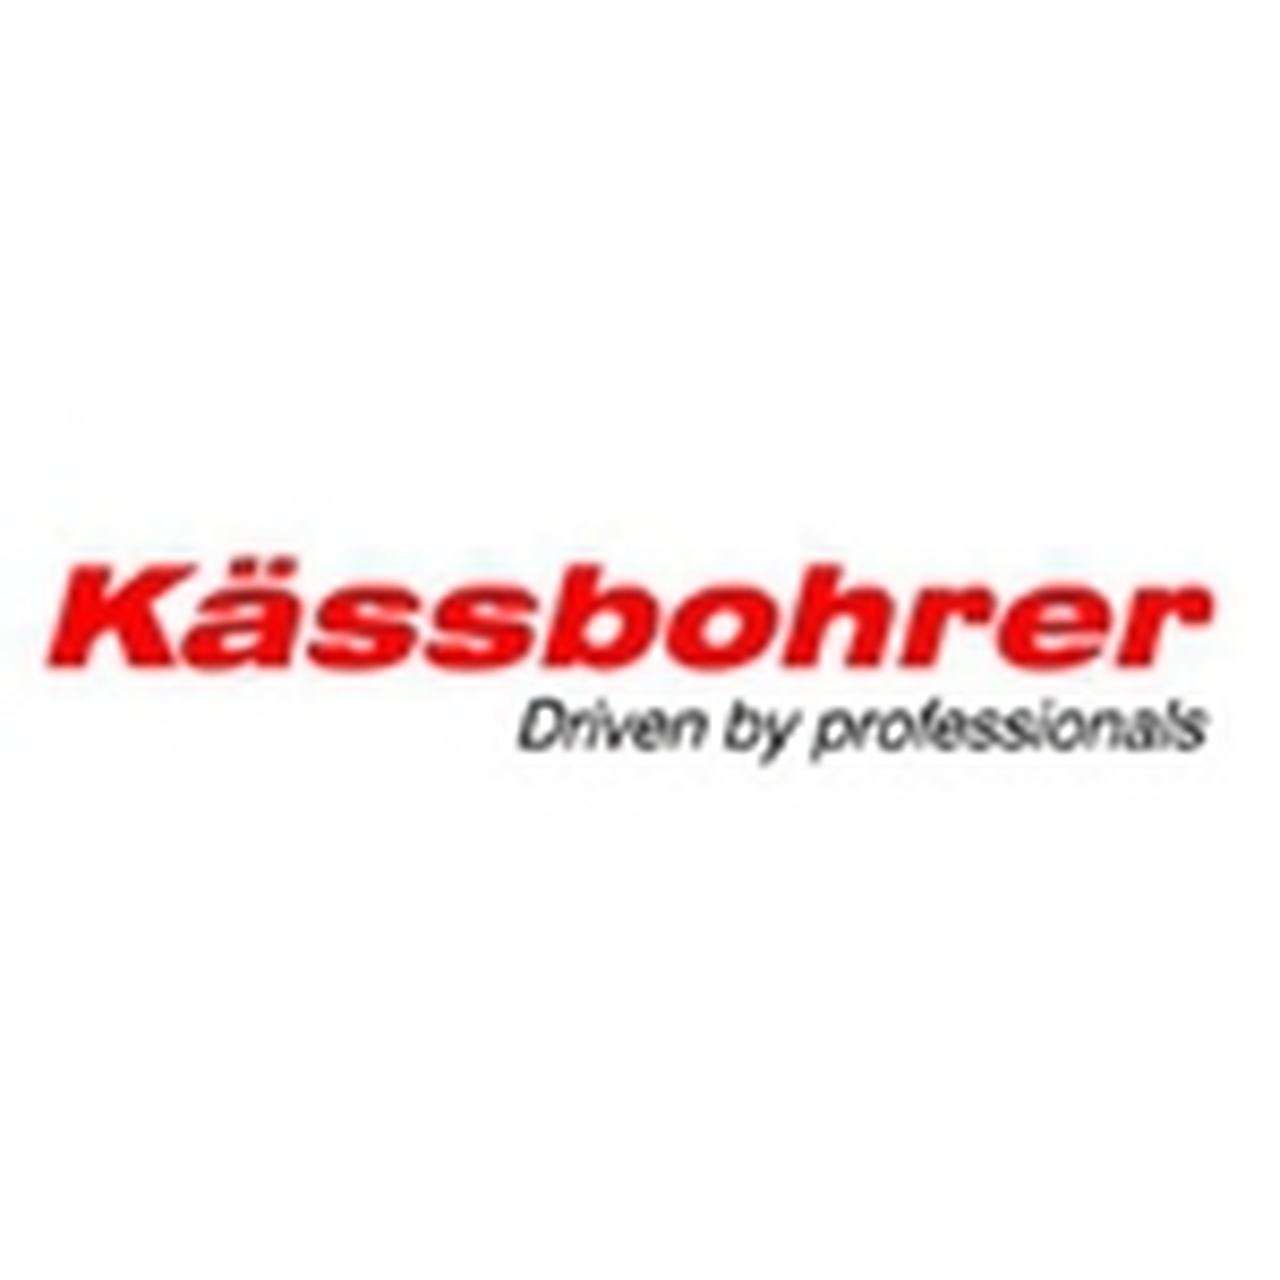 Kassmohrer